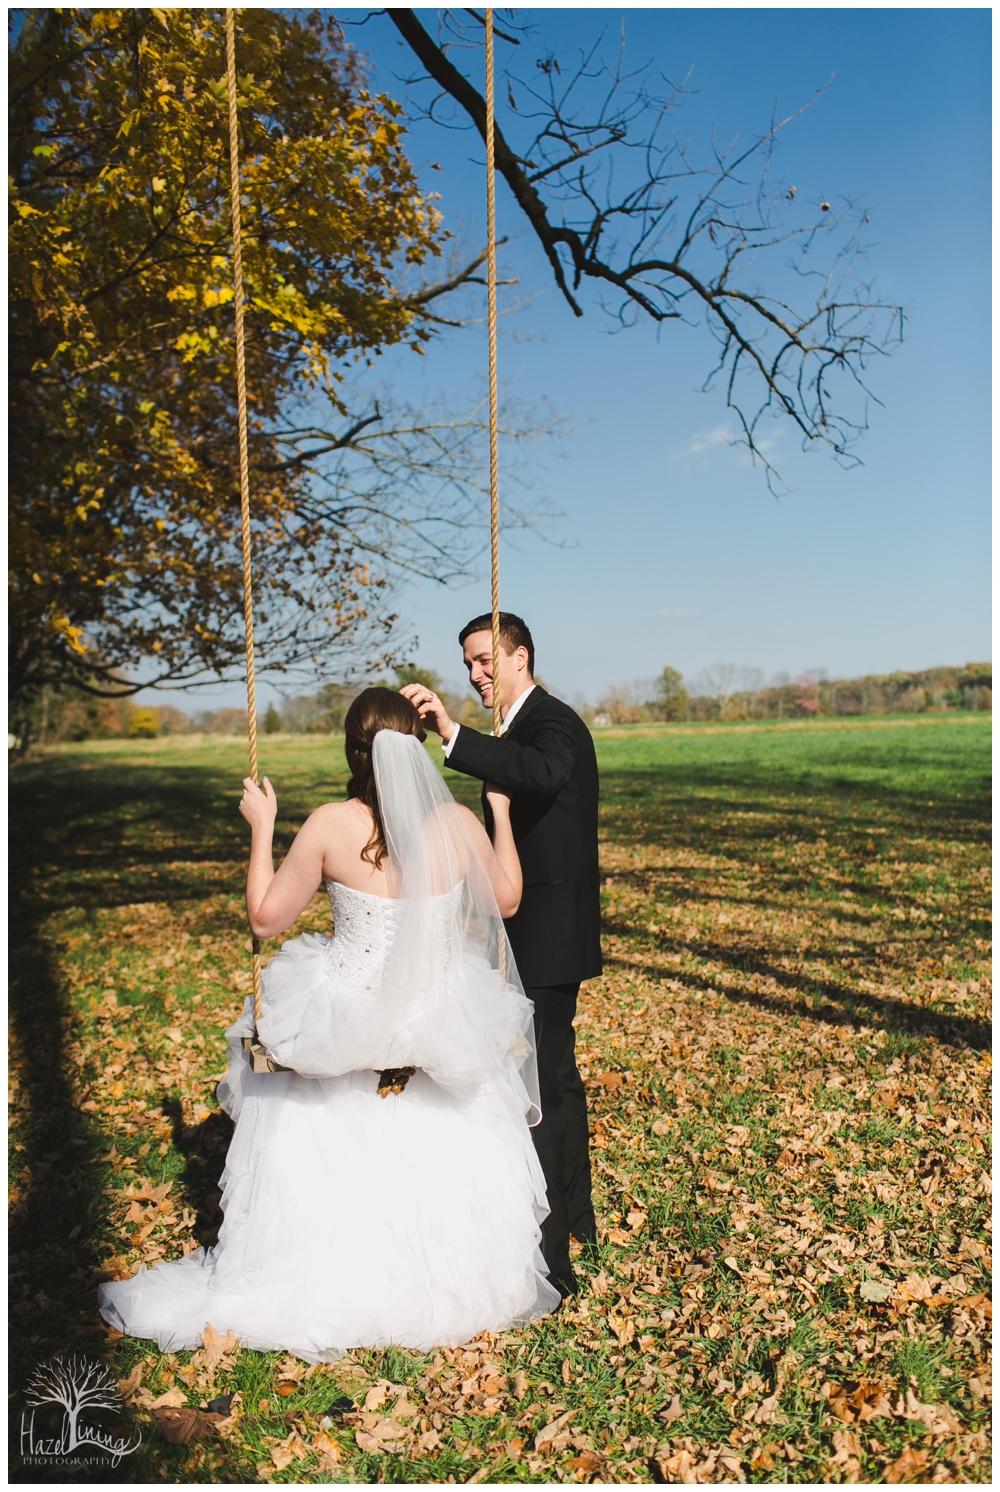 hazel-lining-photography-wedding-portrait-buckscounty-pennsylvania-stephanie-reif_0320.jpg